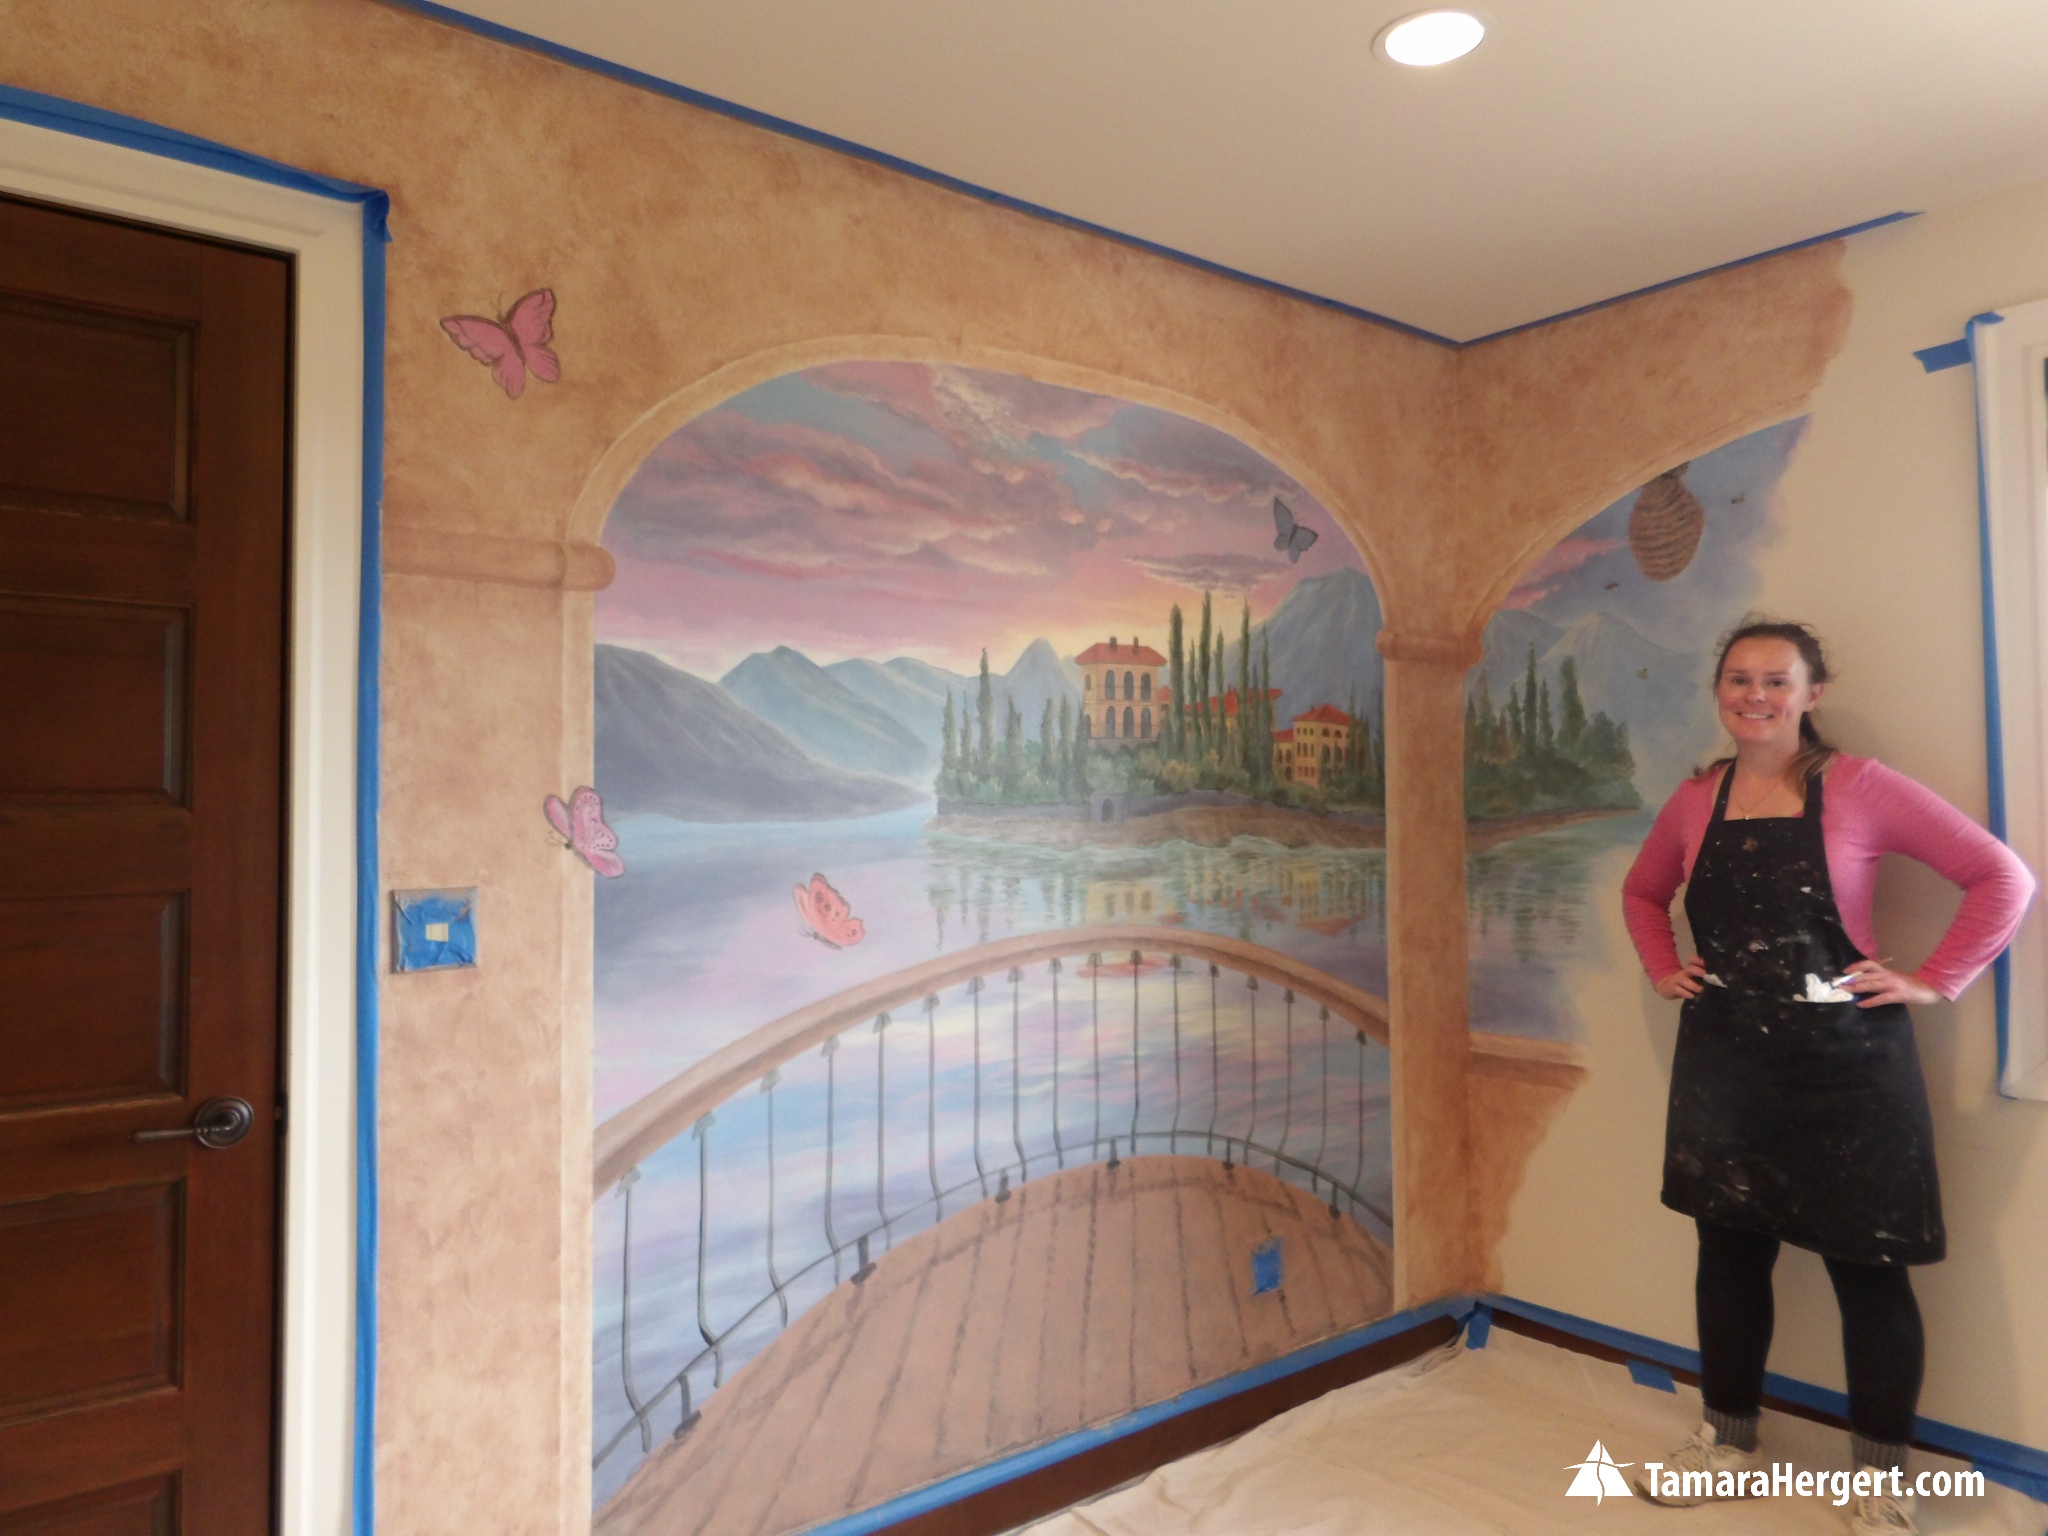 Italian villa mural by Tamara Hergert 1.